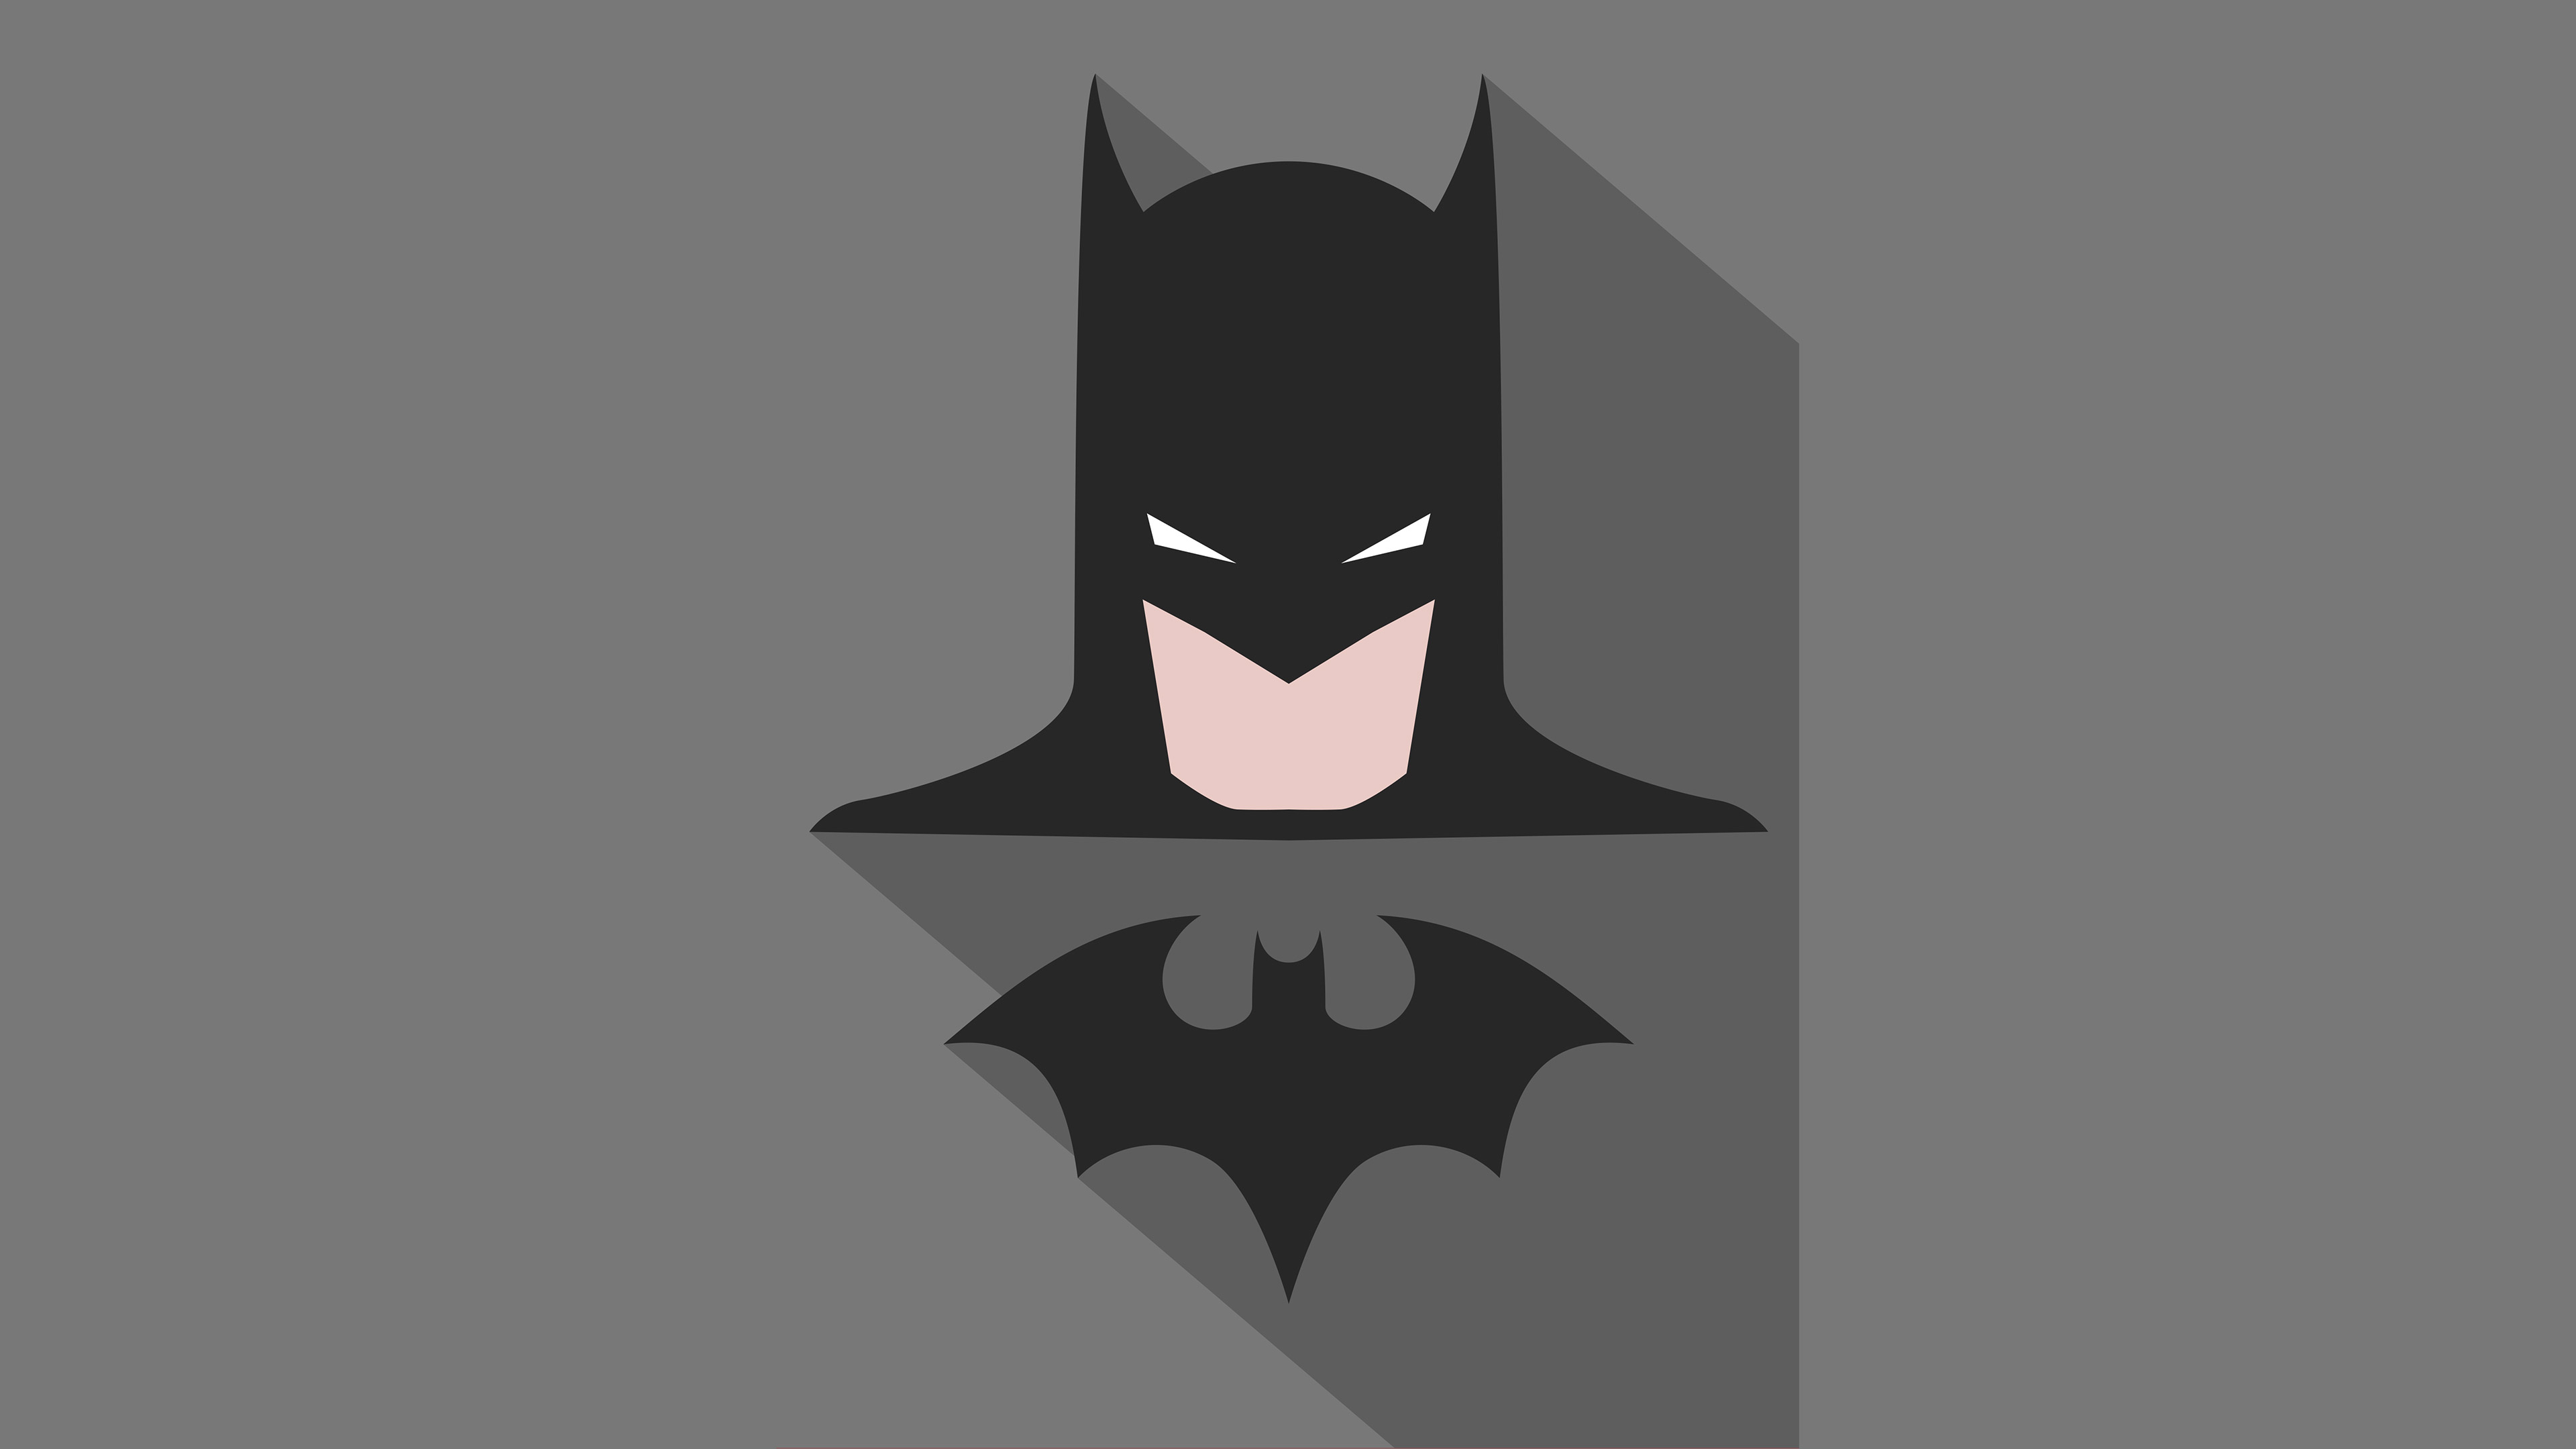 Batman Minimalism Poster, HD Superheroes, 4k Wallpapers